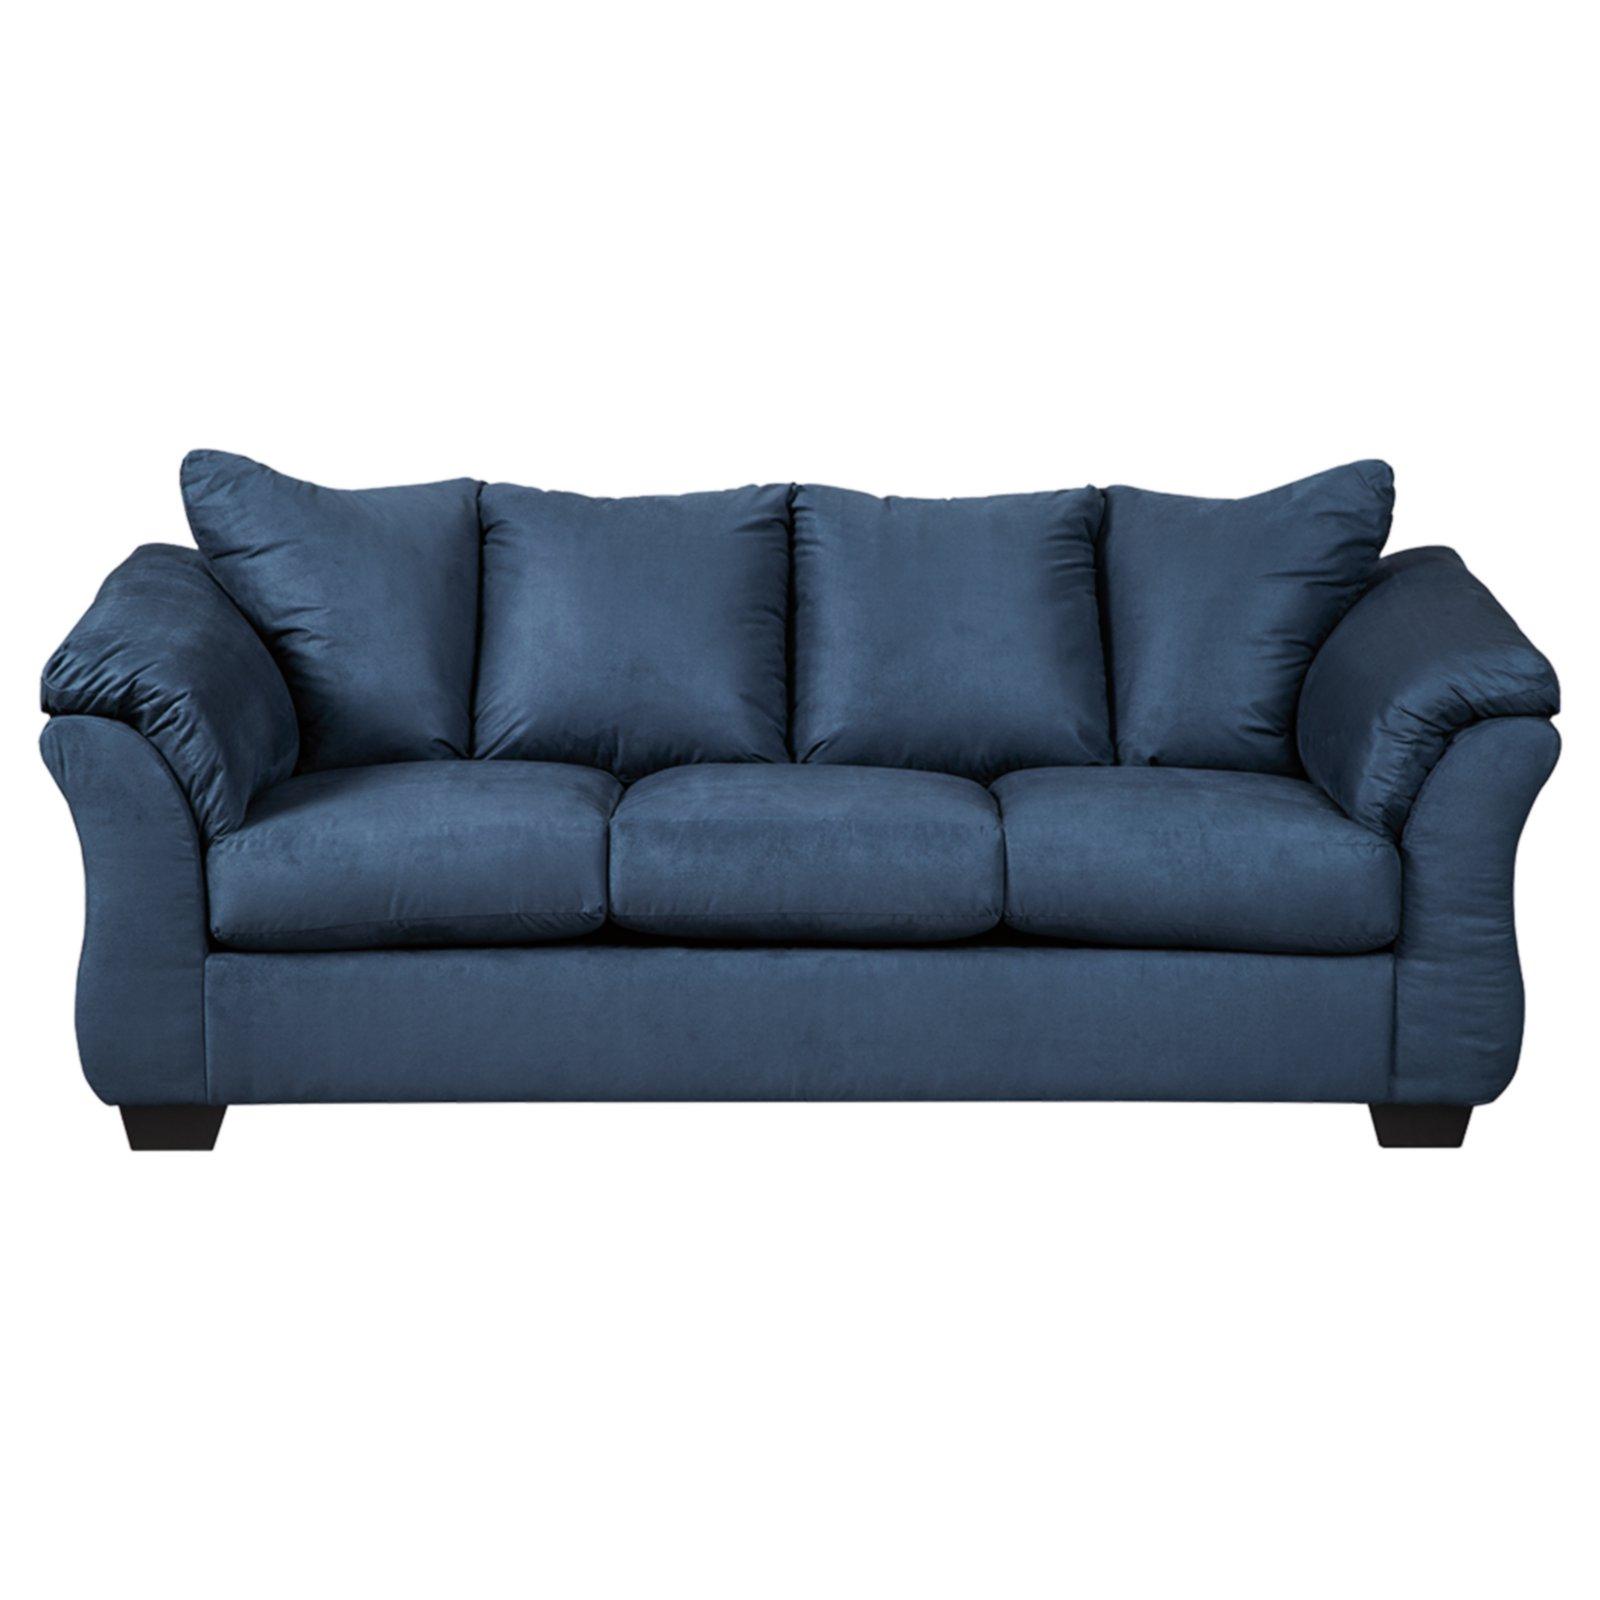 Signature Design by Ashley Darcy Fabric Sofa